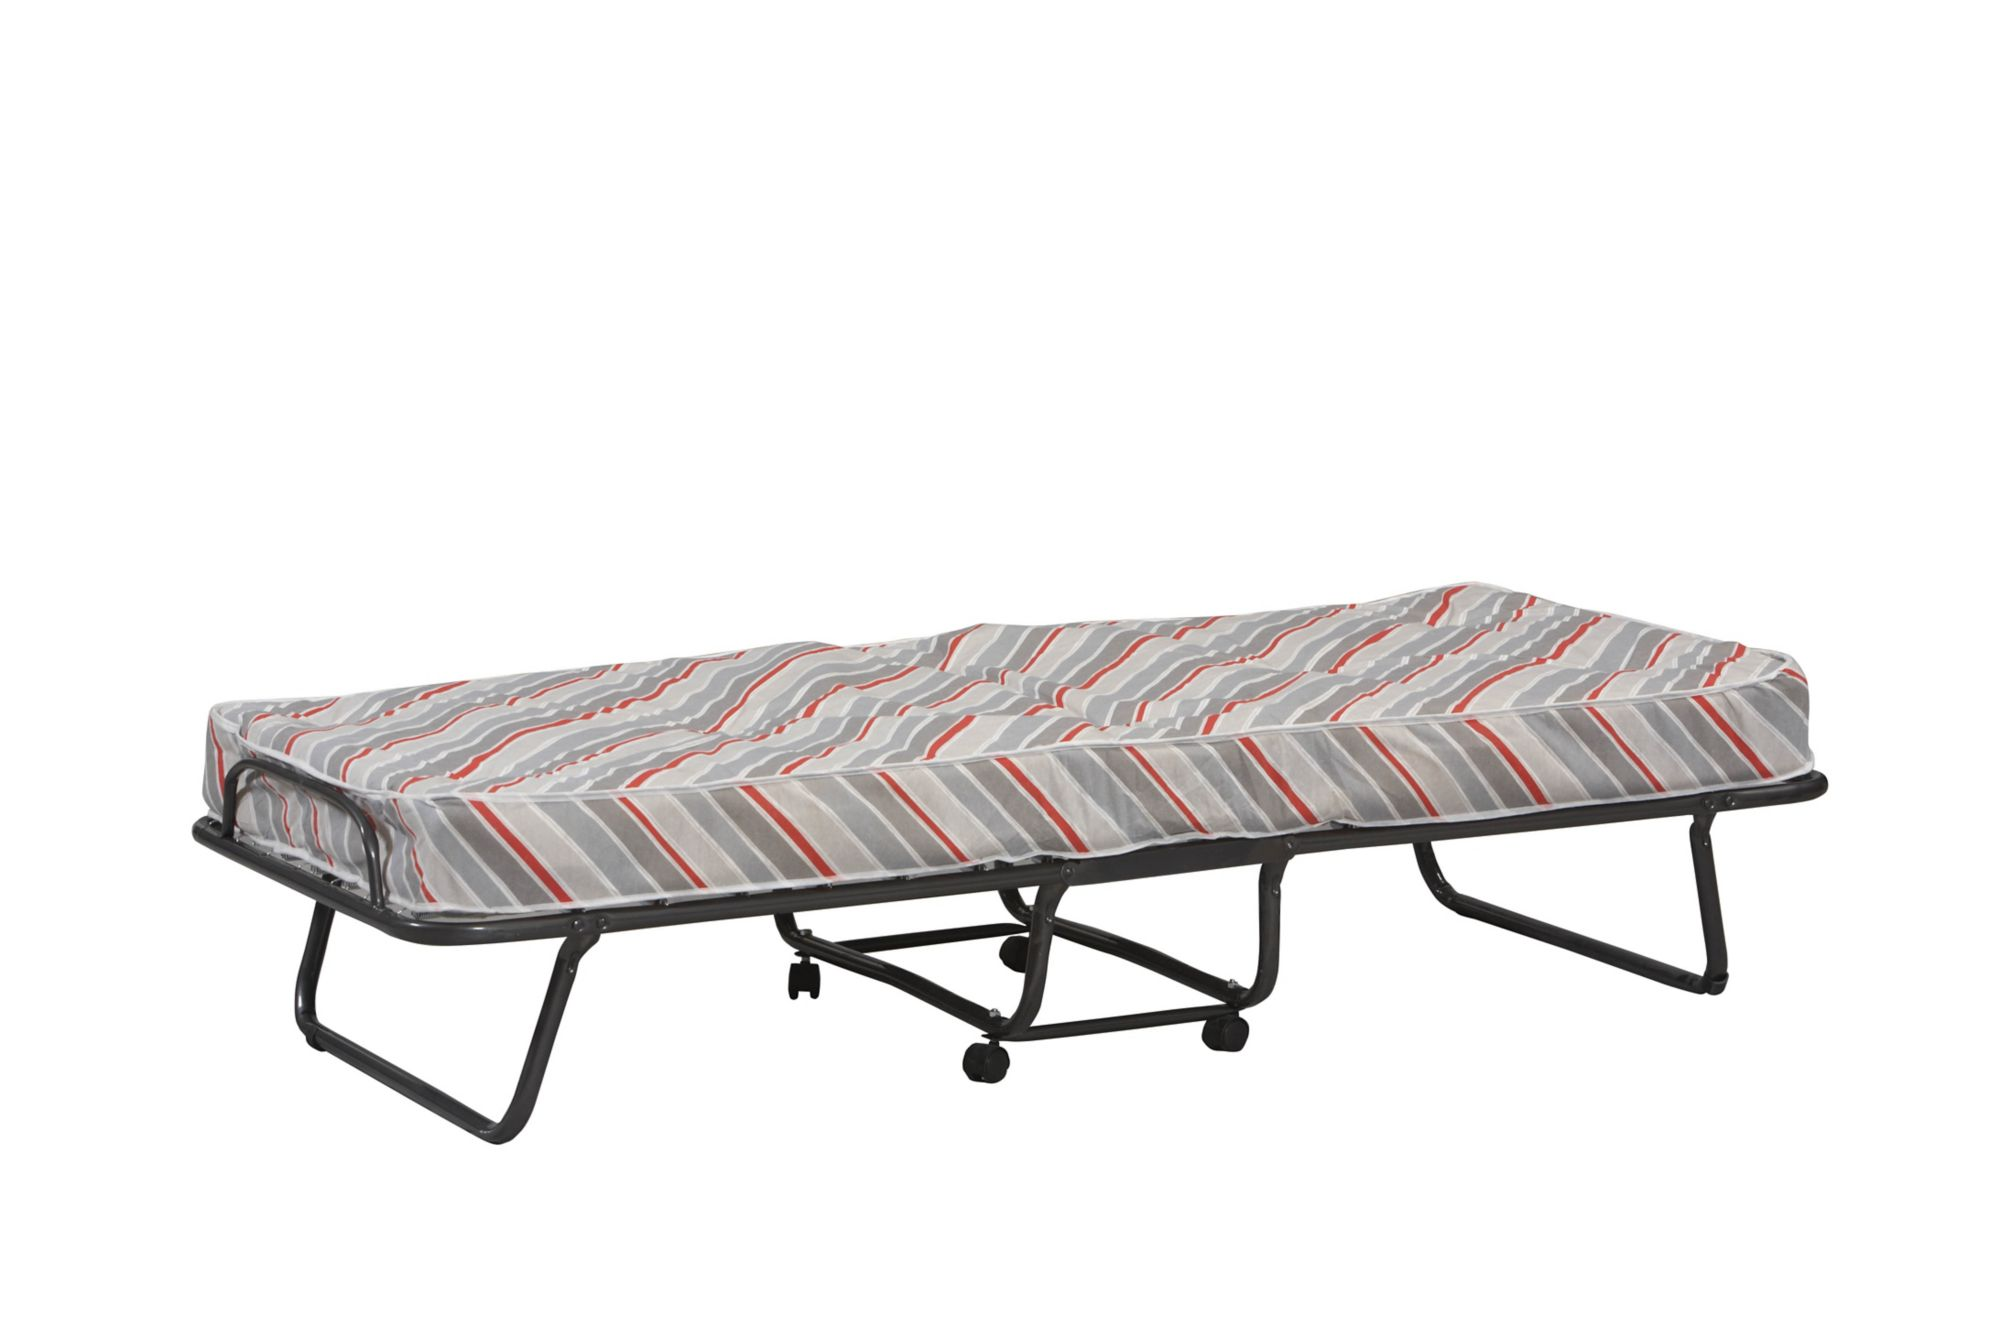 - Linon Torino Ultimate Folding Bed - Multicolor - BJs WholeSale Club